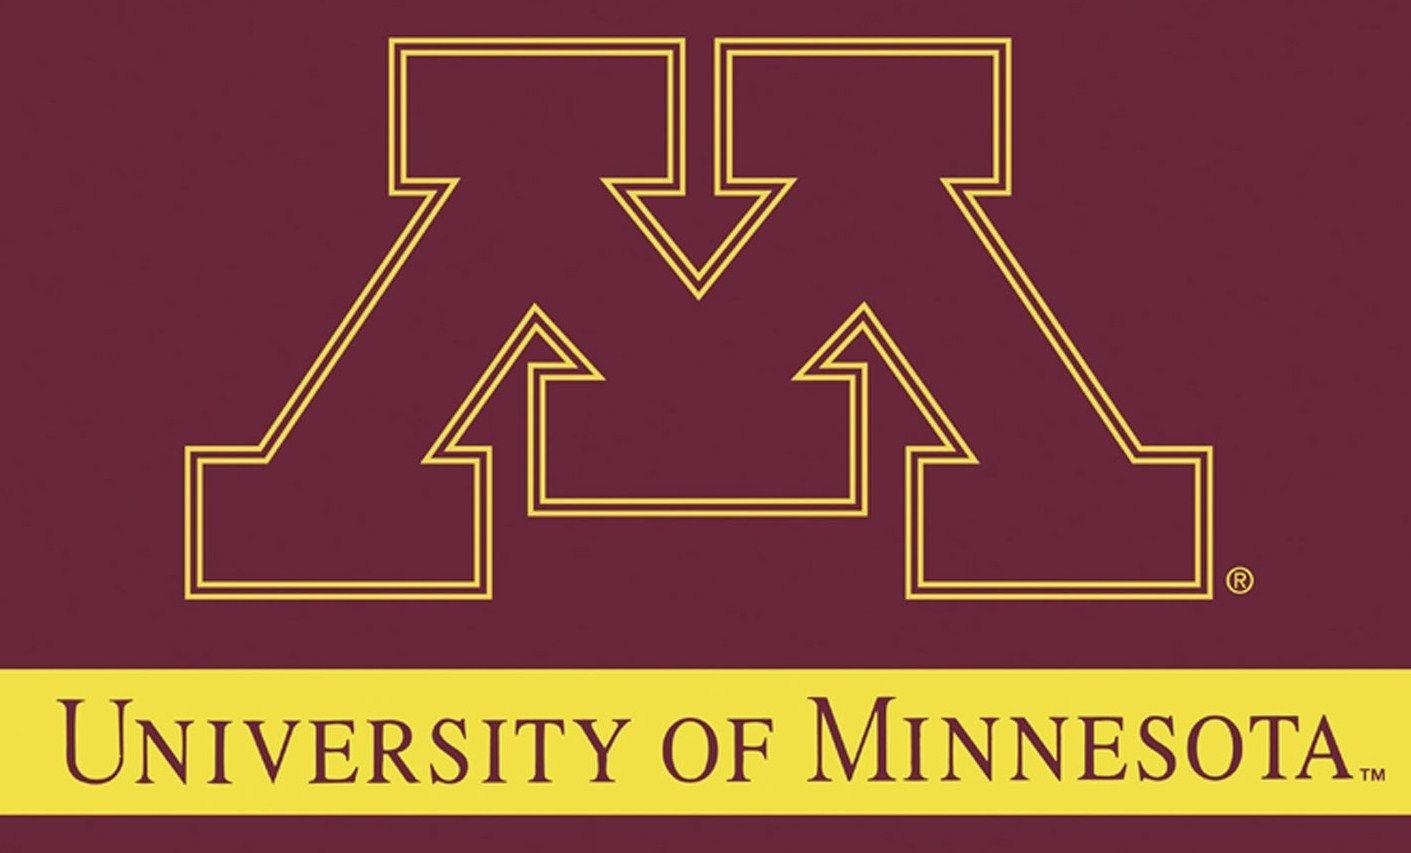 Wallpaper Stores Twin Cities Mn Wallppapers Gallery University Of Minnesota Minnesota Golden Gophers Creative Problem Solving